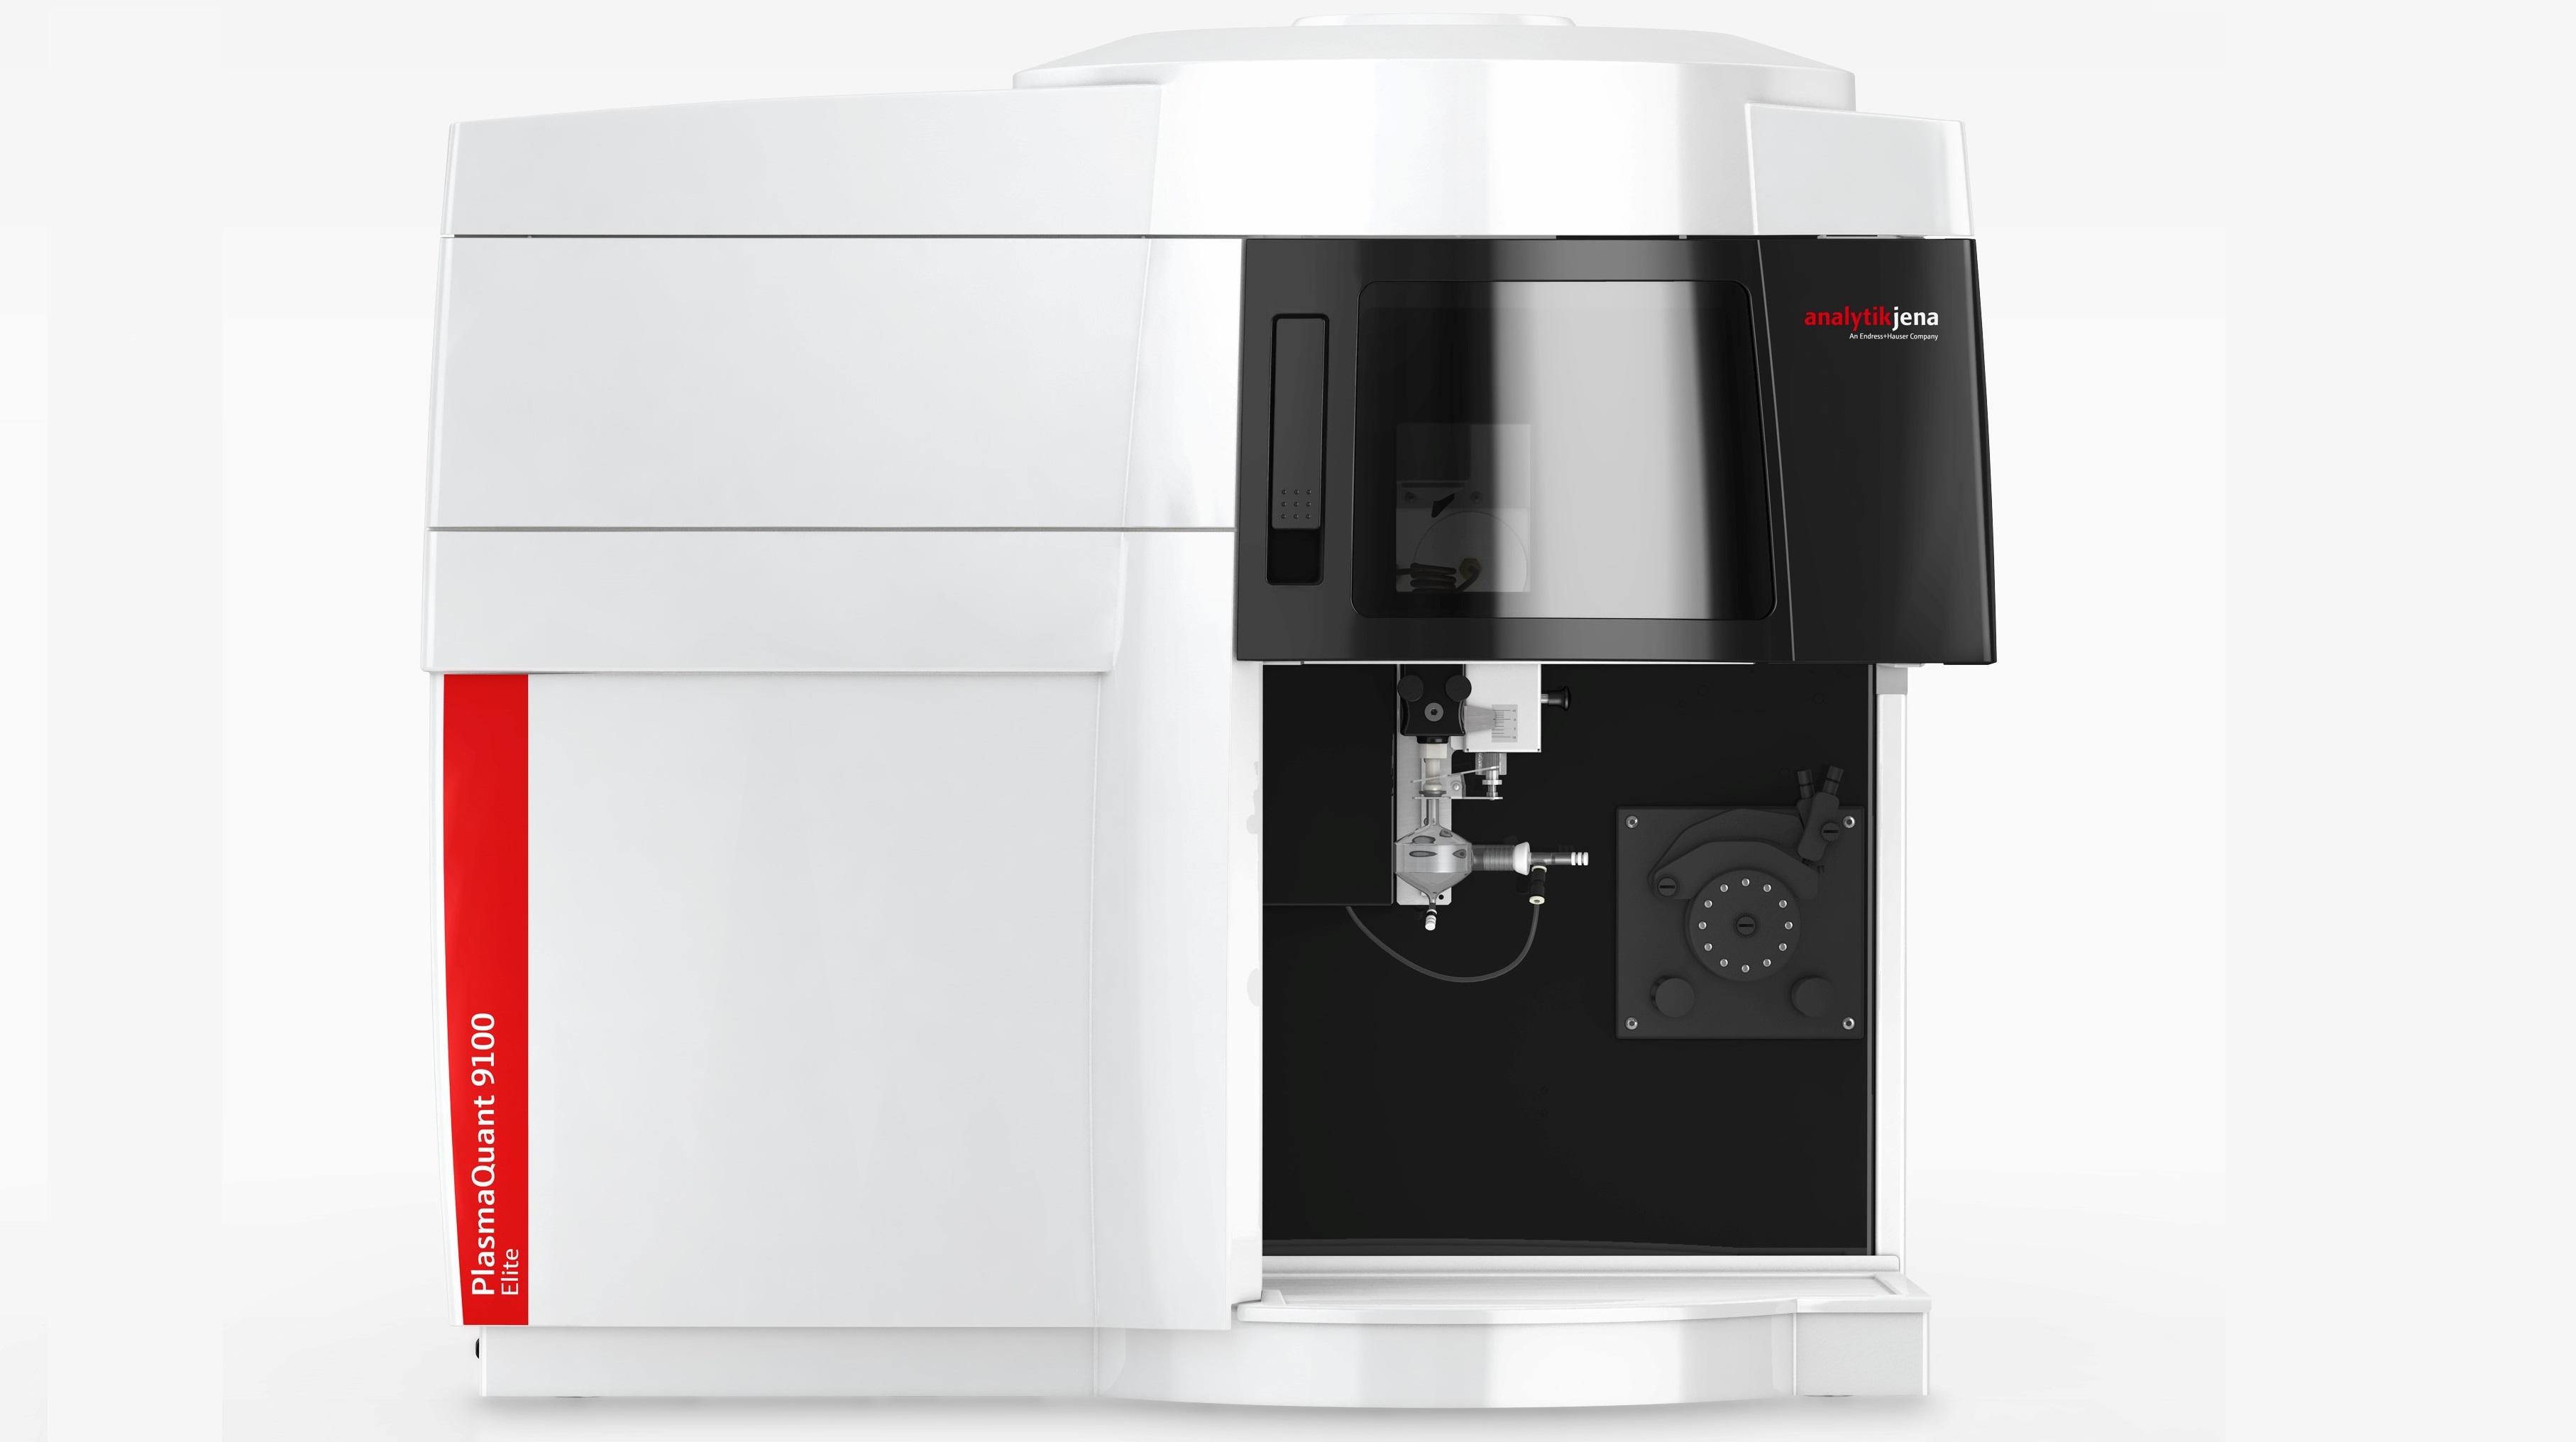 ICP発光分光分析装置PQ9100Elite